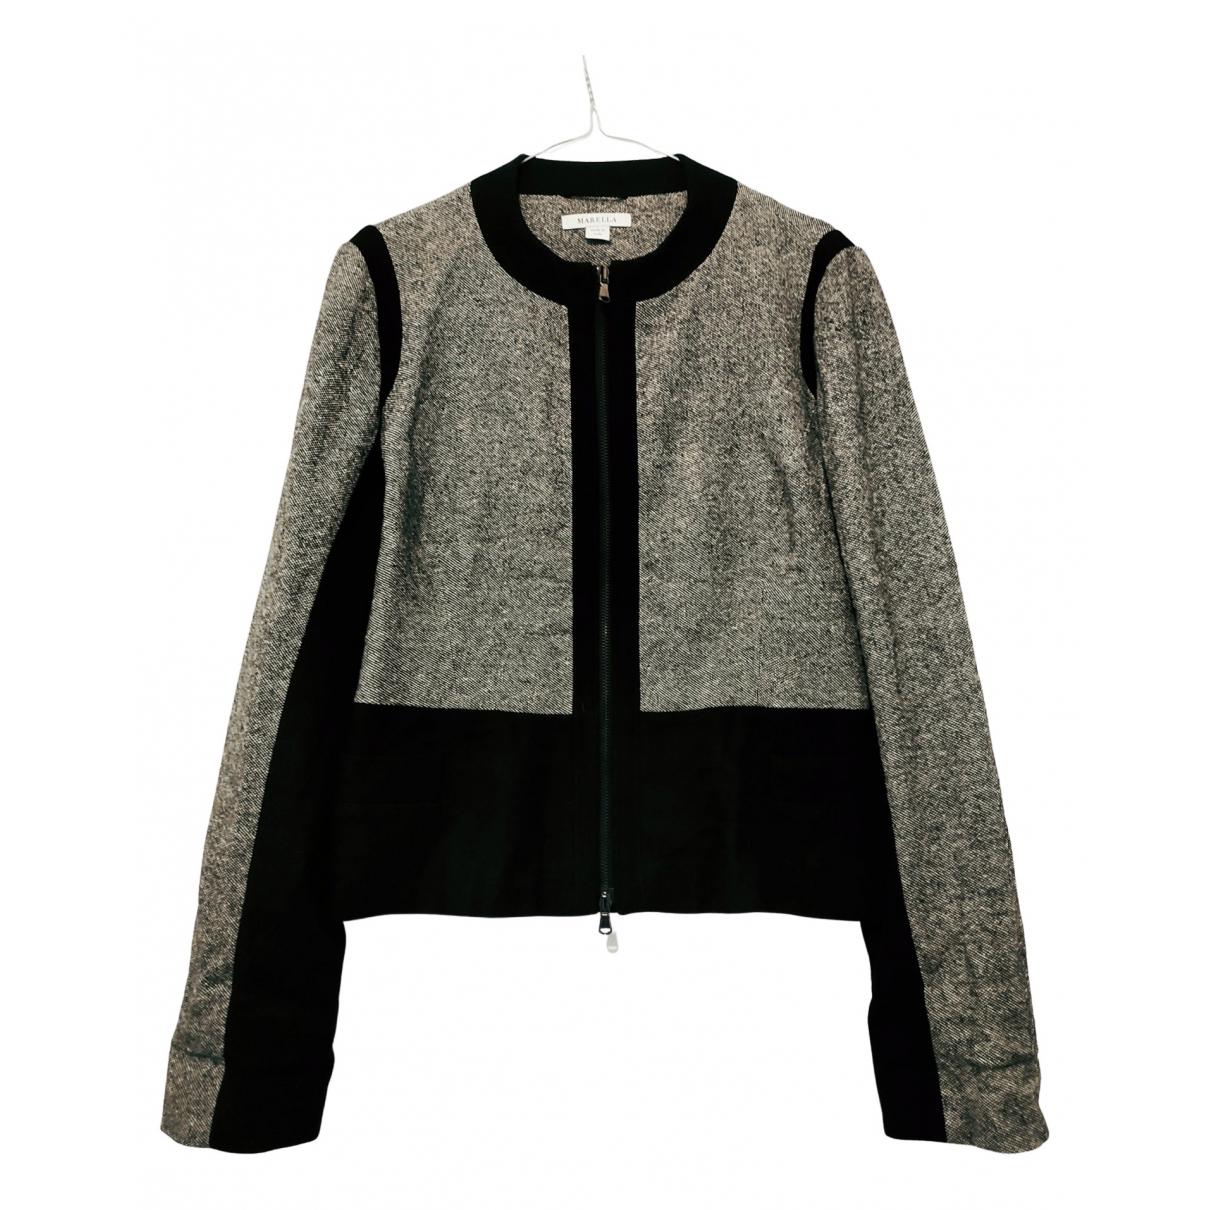 Marella N Wool jacket for Women 18-20 UK